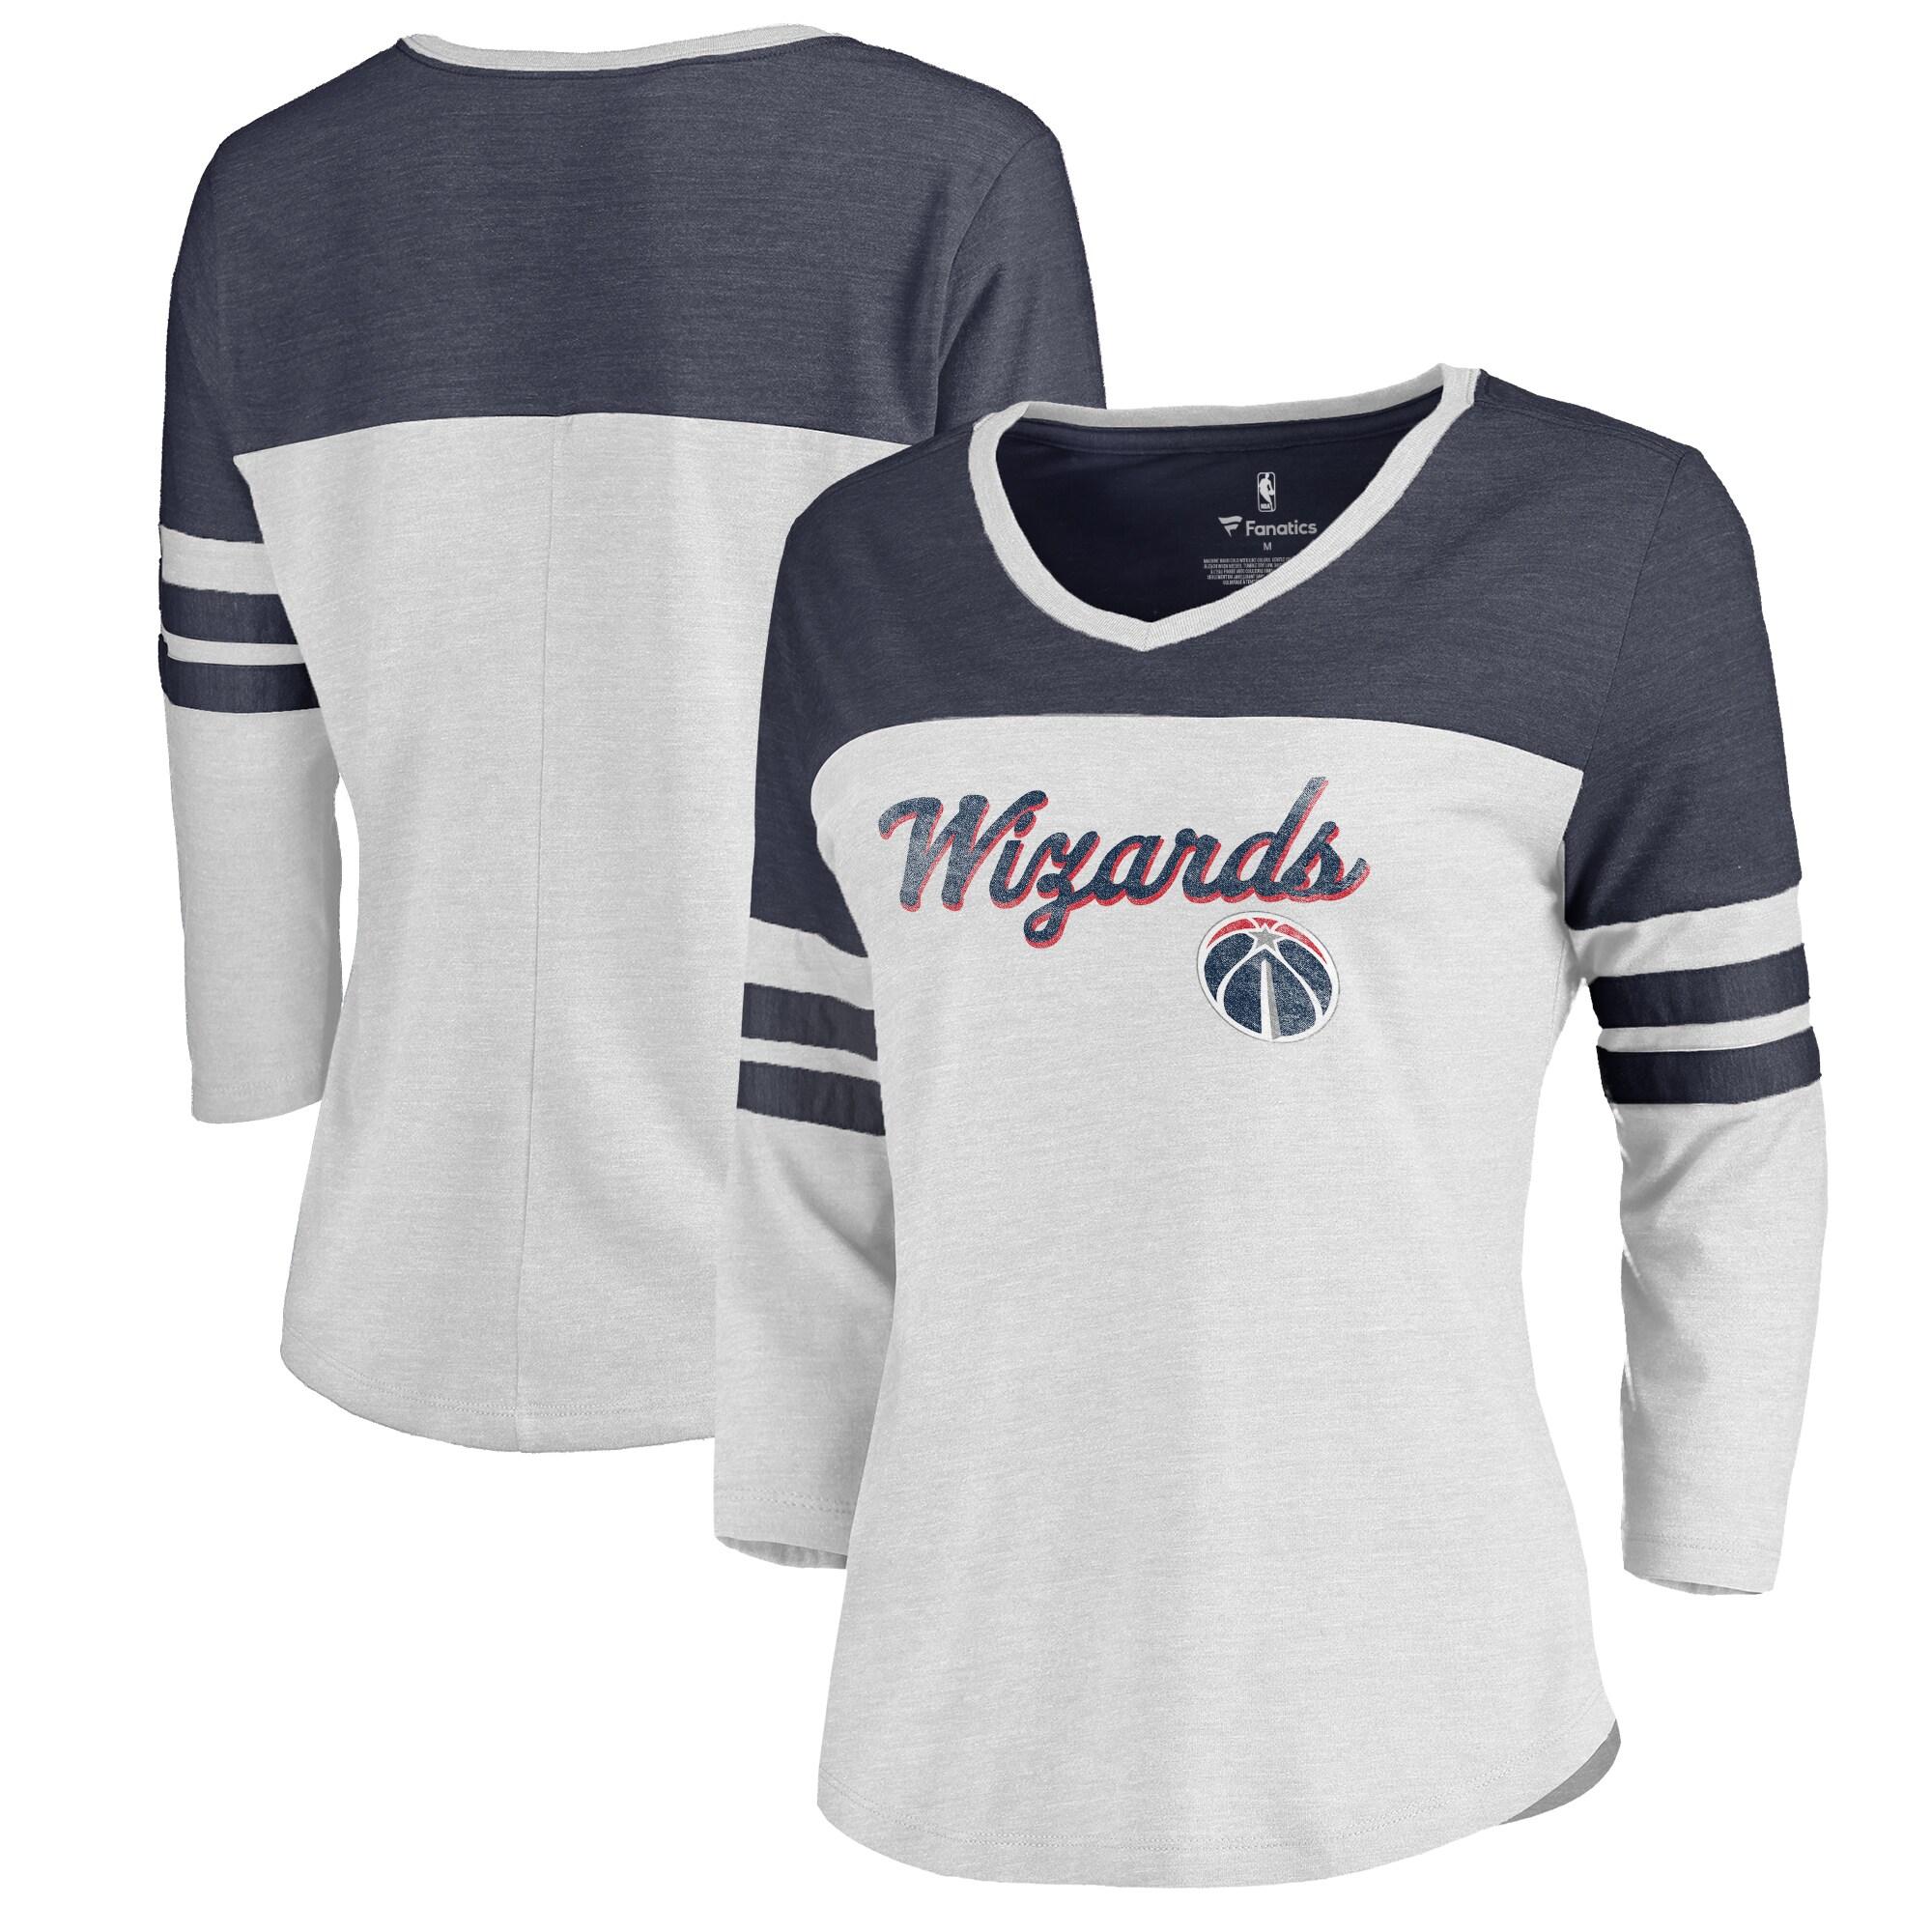 Washington Wizards Fanatics Branded Women's Rising Script Plus Size Color Block 3/4 Sleeve Tri-Blend T-Shirt - White